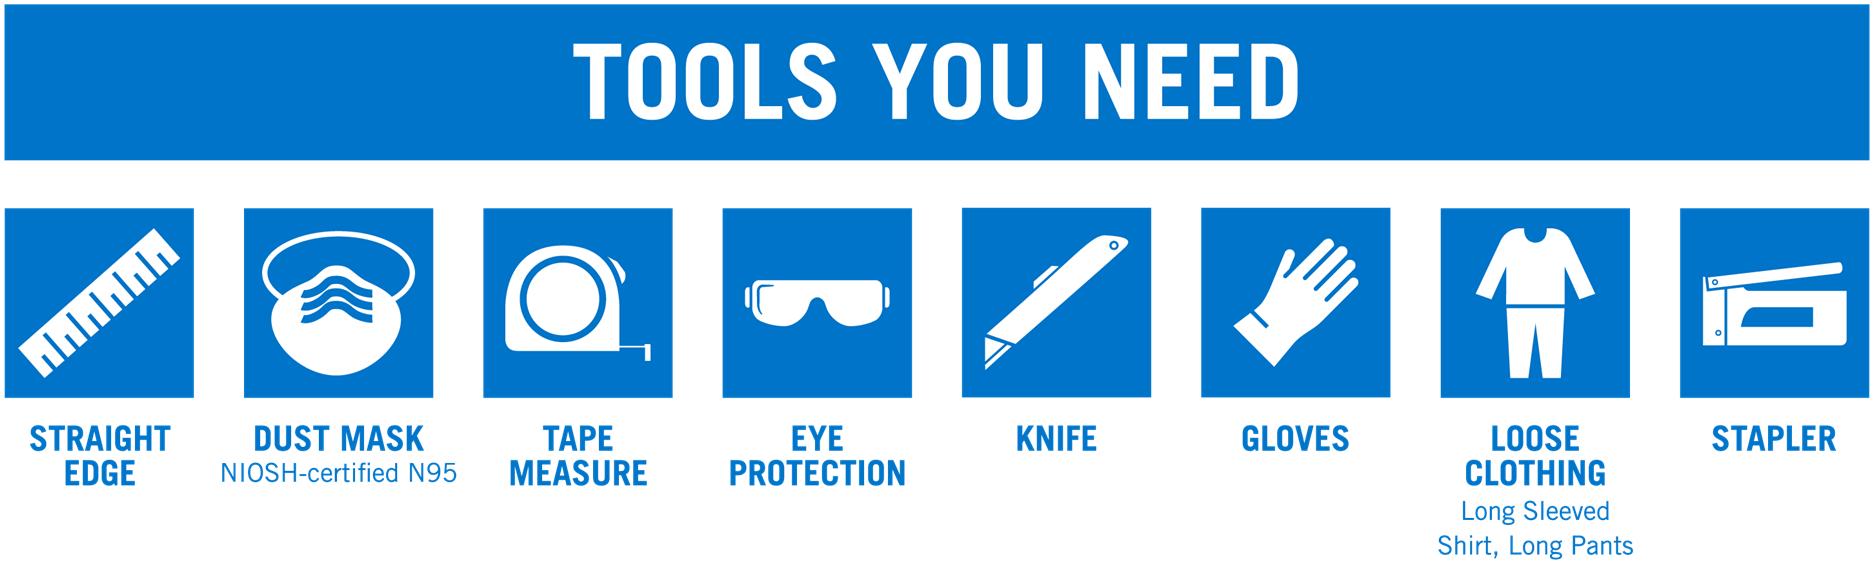 Tools Needed To Install fiberglass Batt Insulation